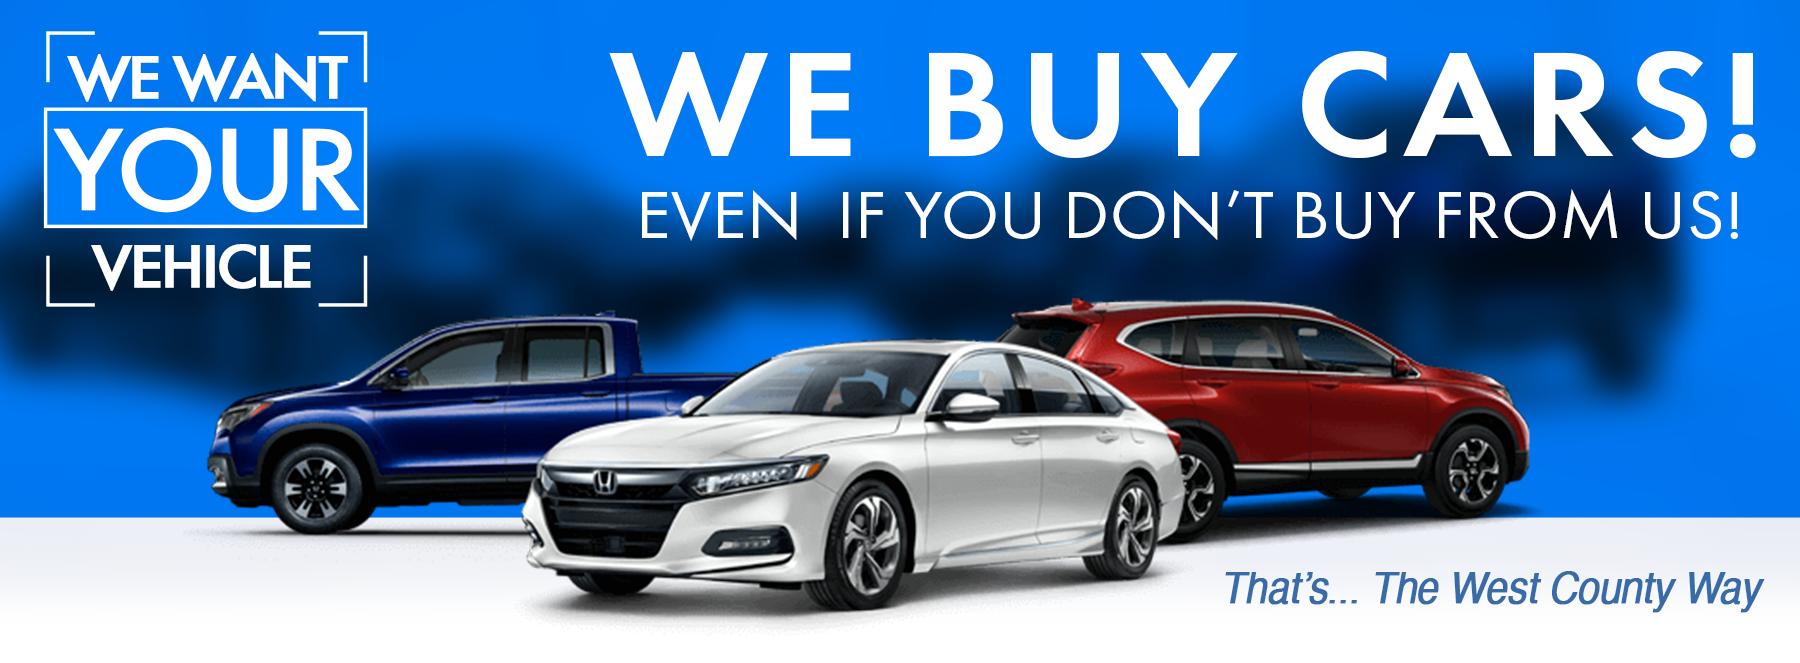 WCH-We Buy Cars-0721